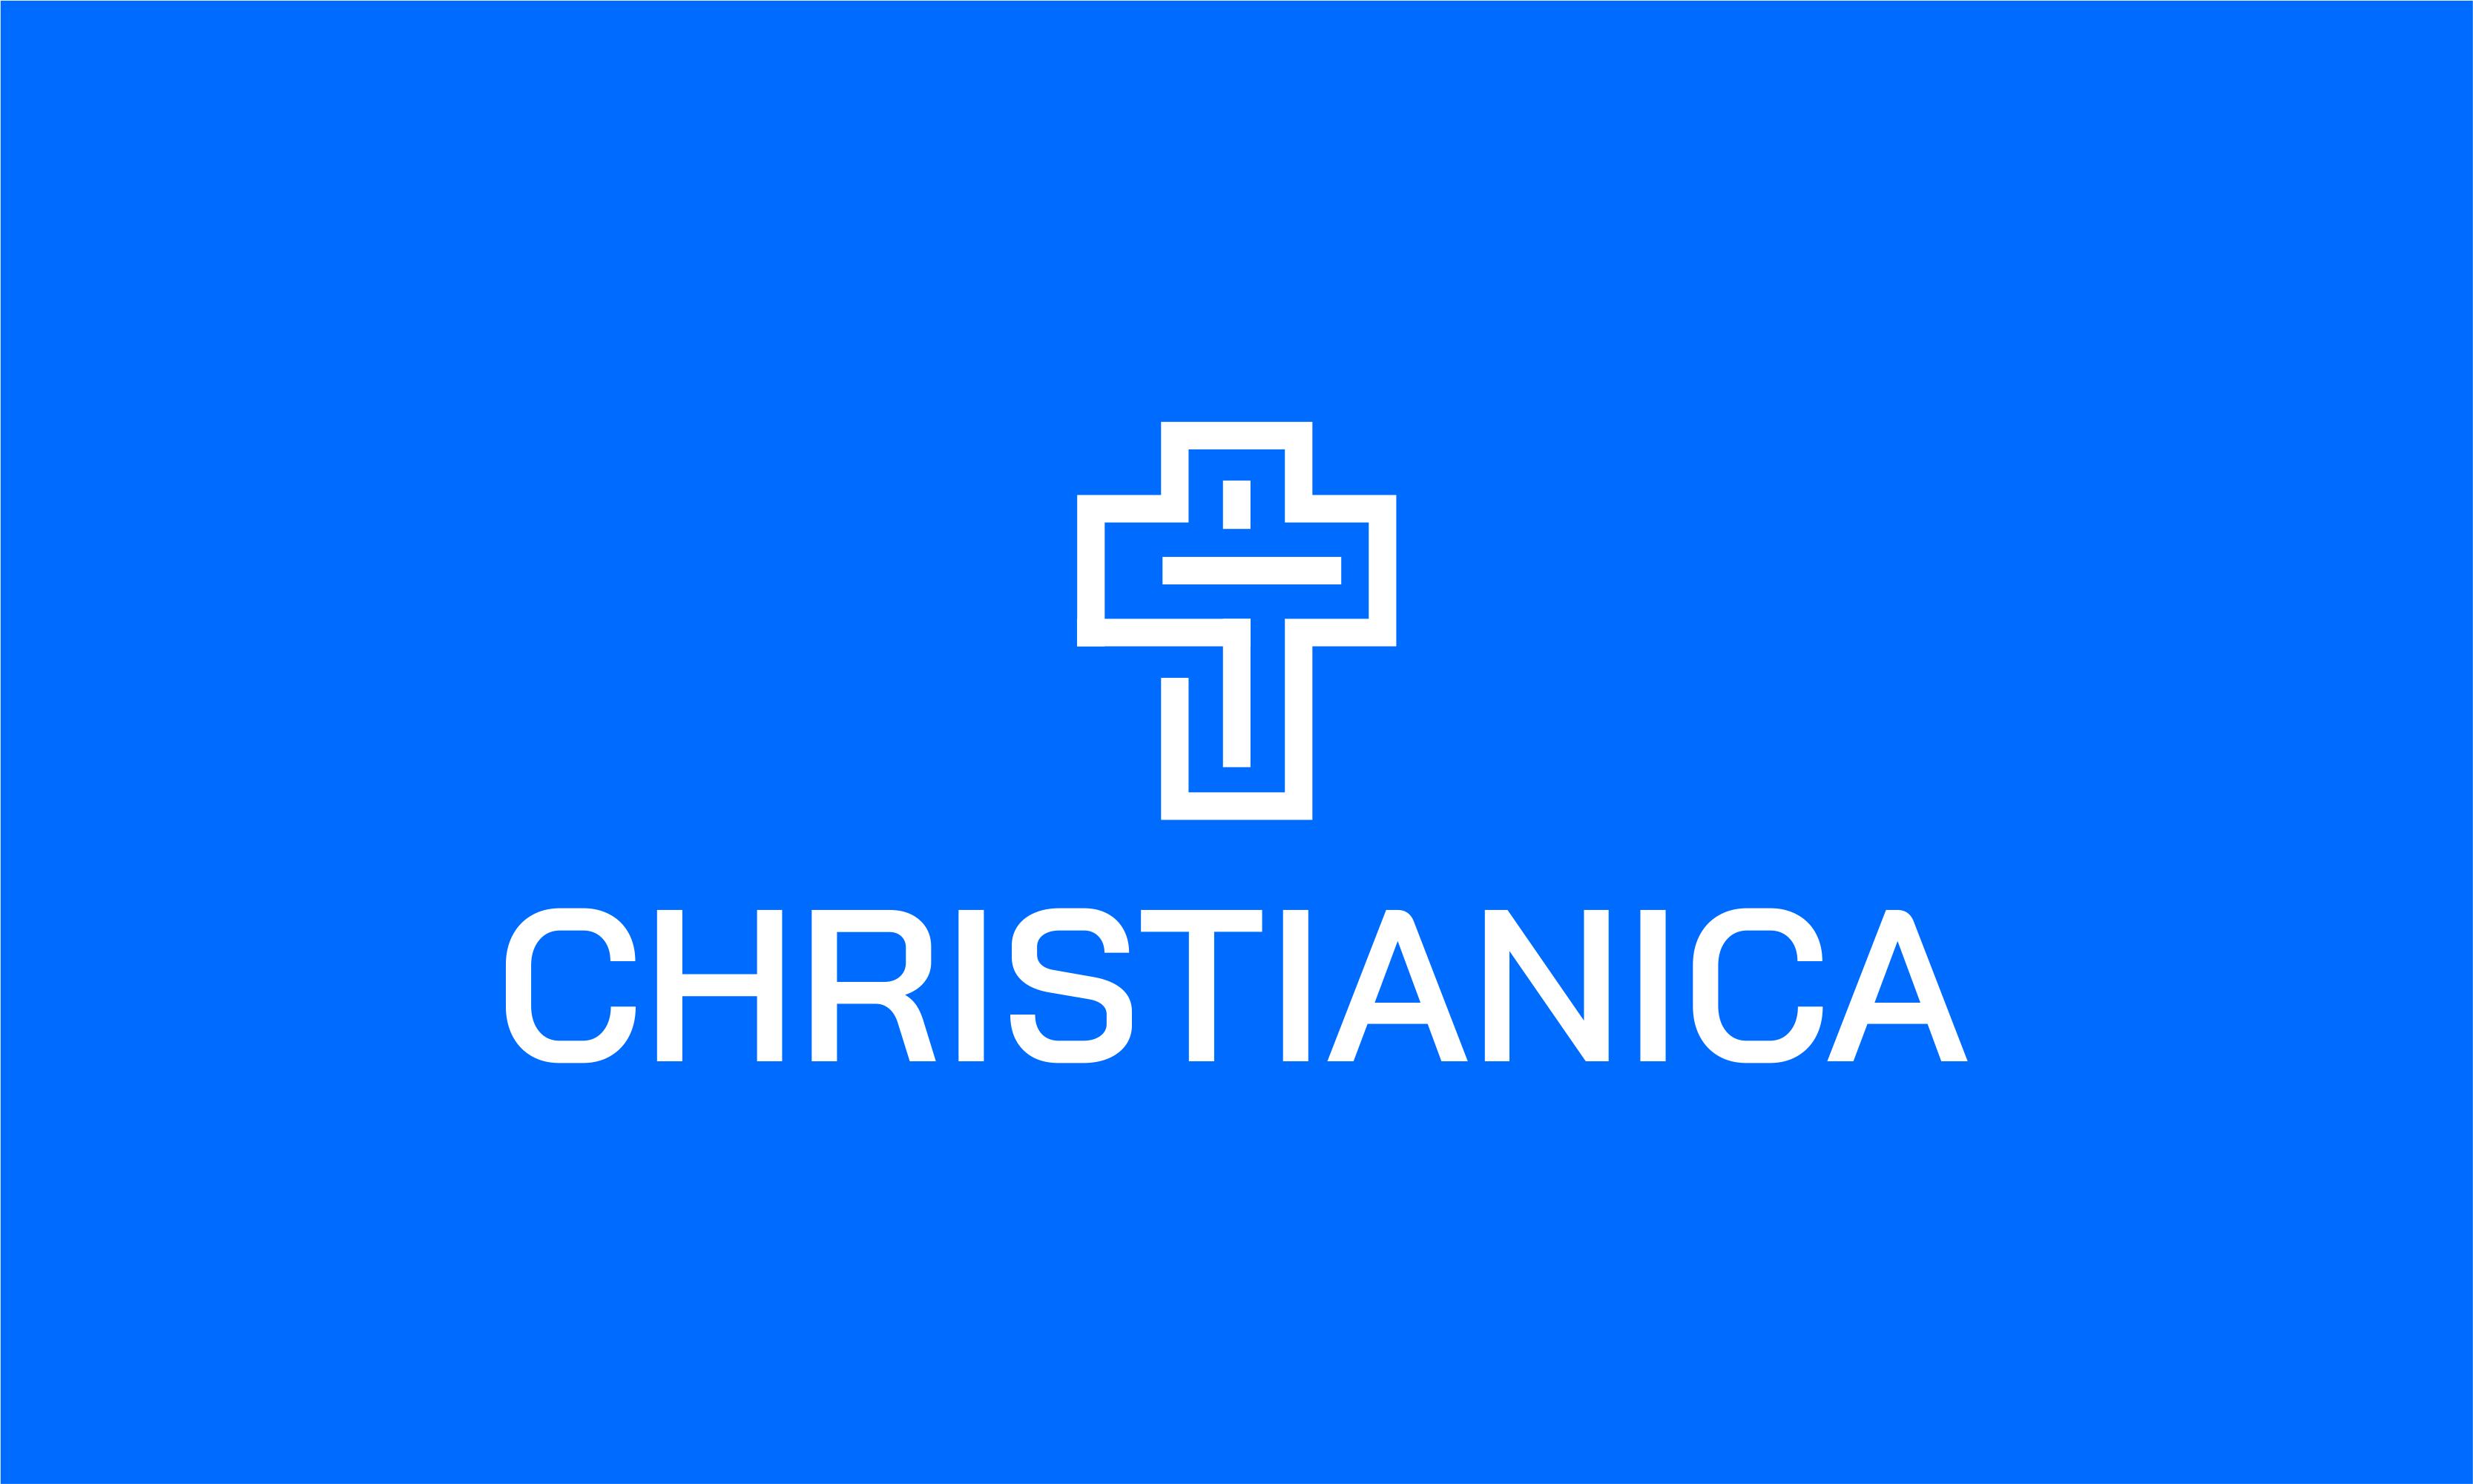 Christianica